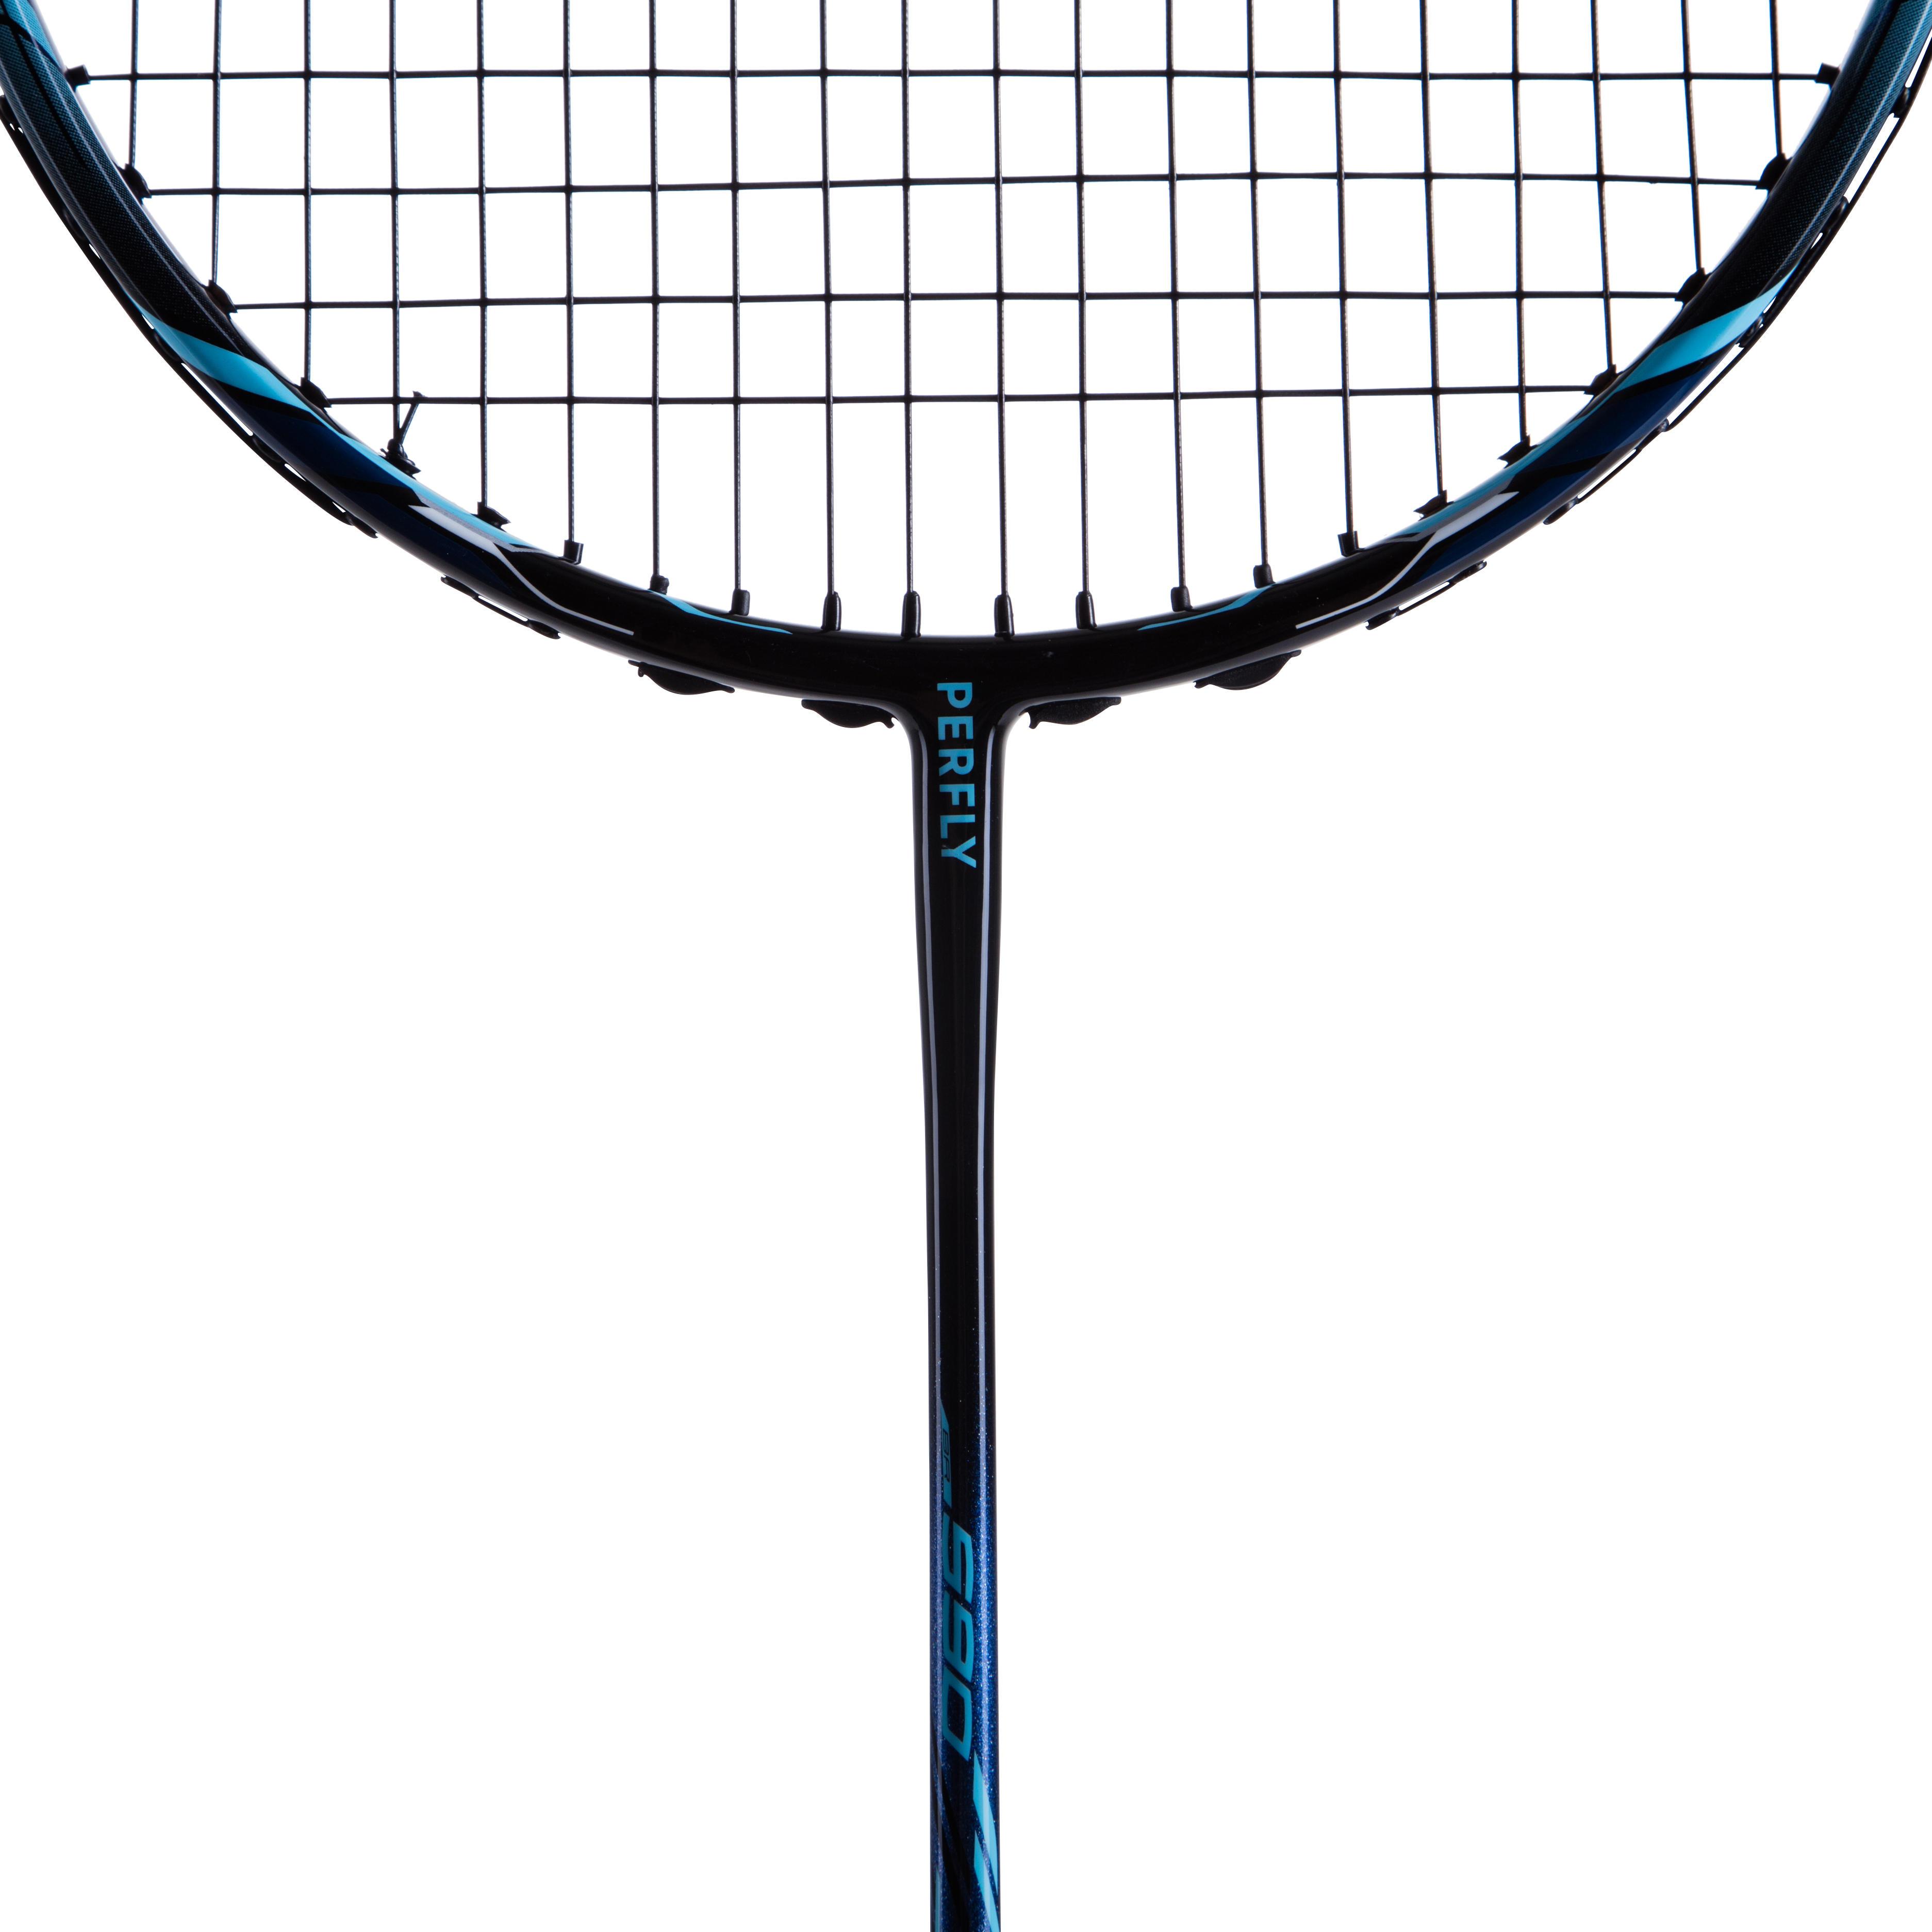 Sweat Band Wrist Gym Sports Wristband Tennis Badminton Squash Cream 10 Pack